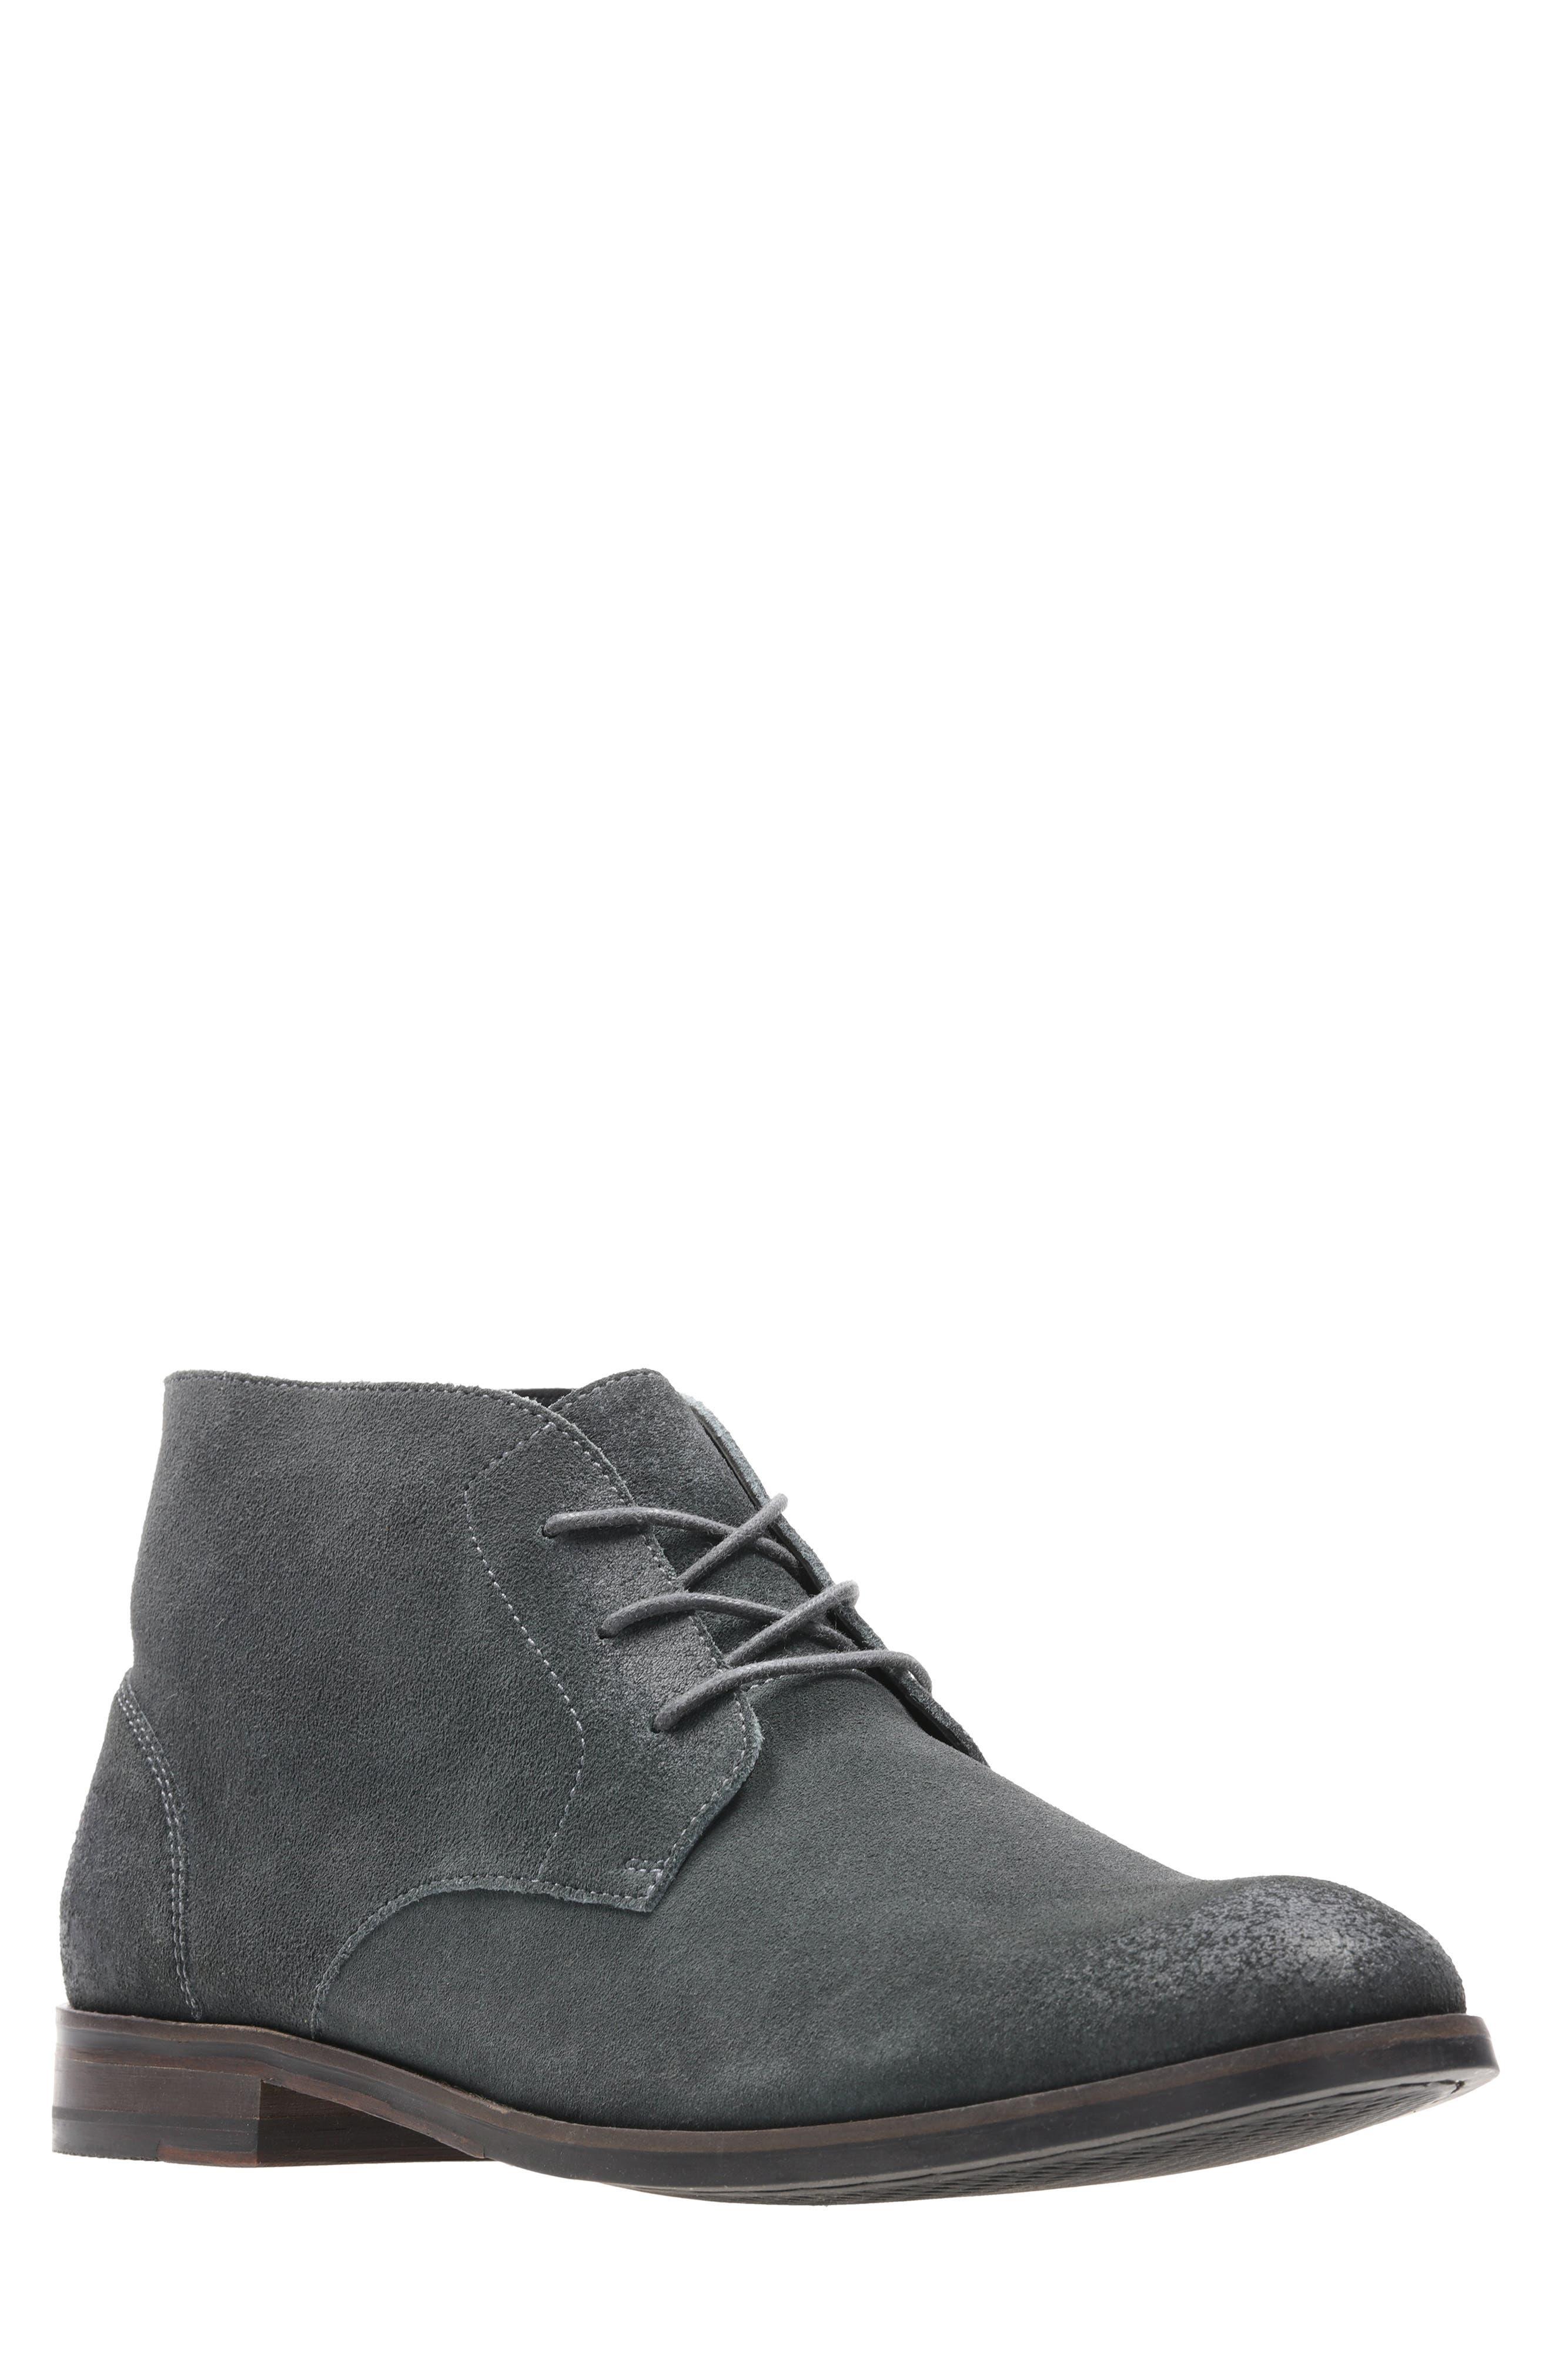 Flow Top Chukka Boot, Main, color, DARK GREY SUEDE